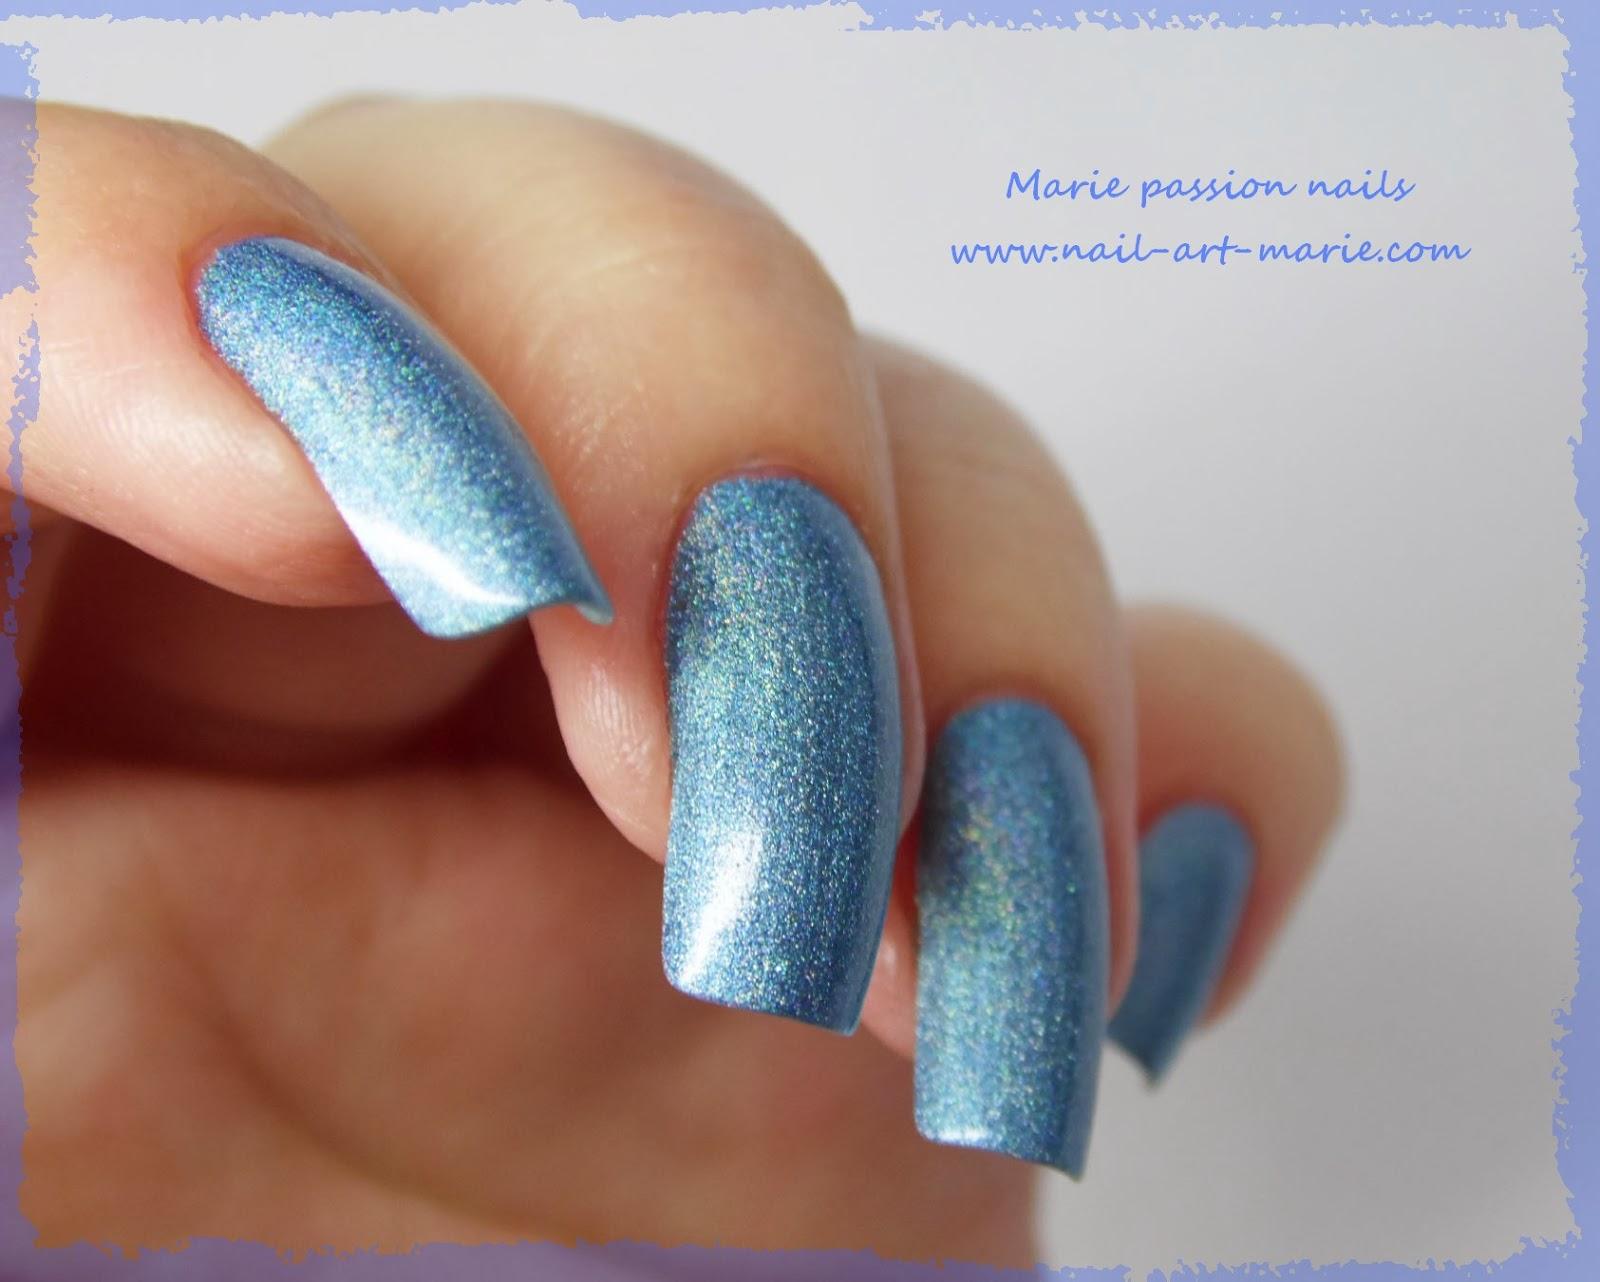 LM Cosmetic Nunki7